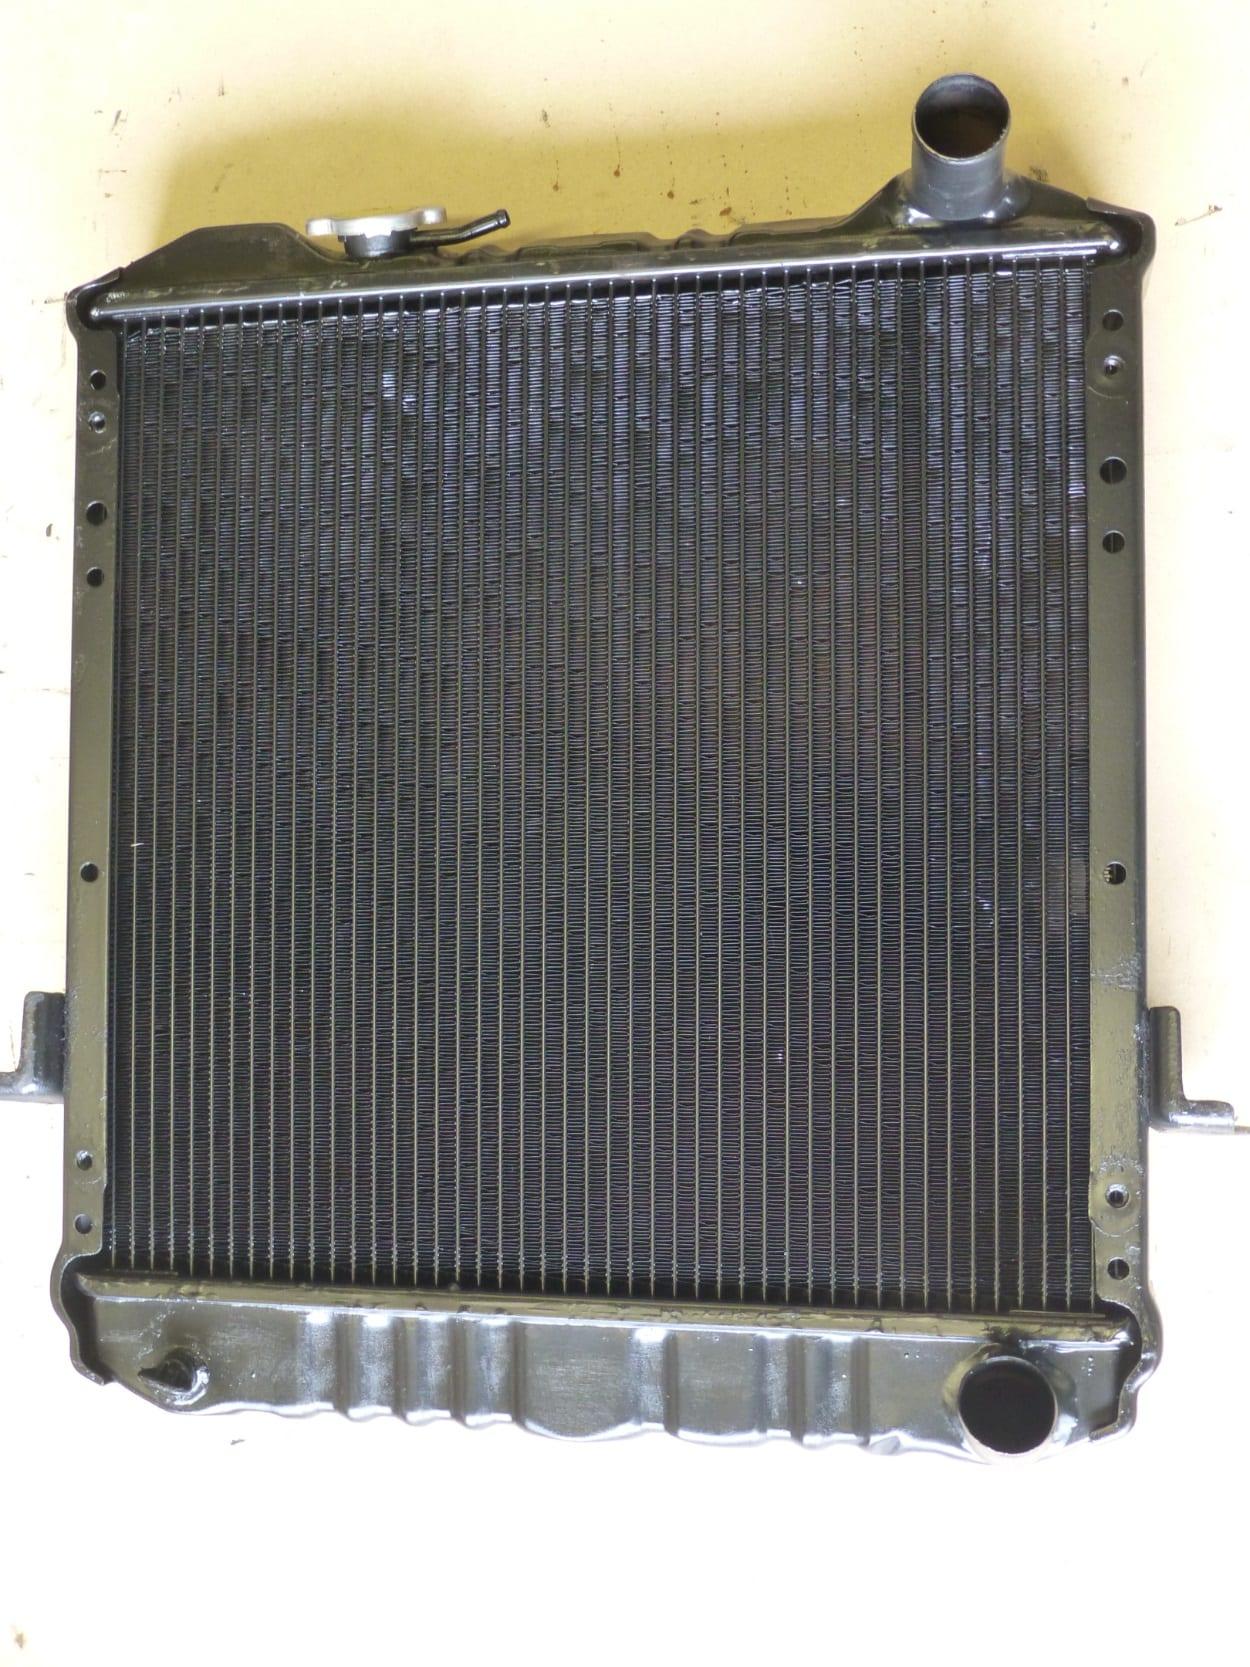 Isuzu HKR Radiator Recored Bideford Devon